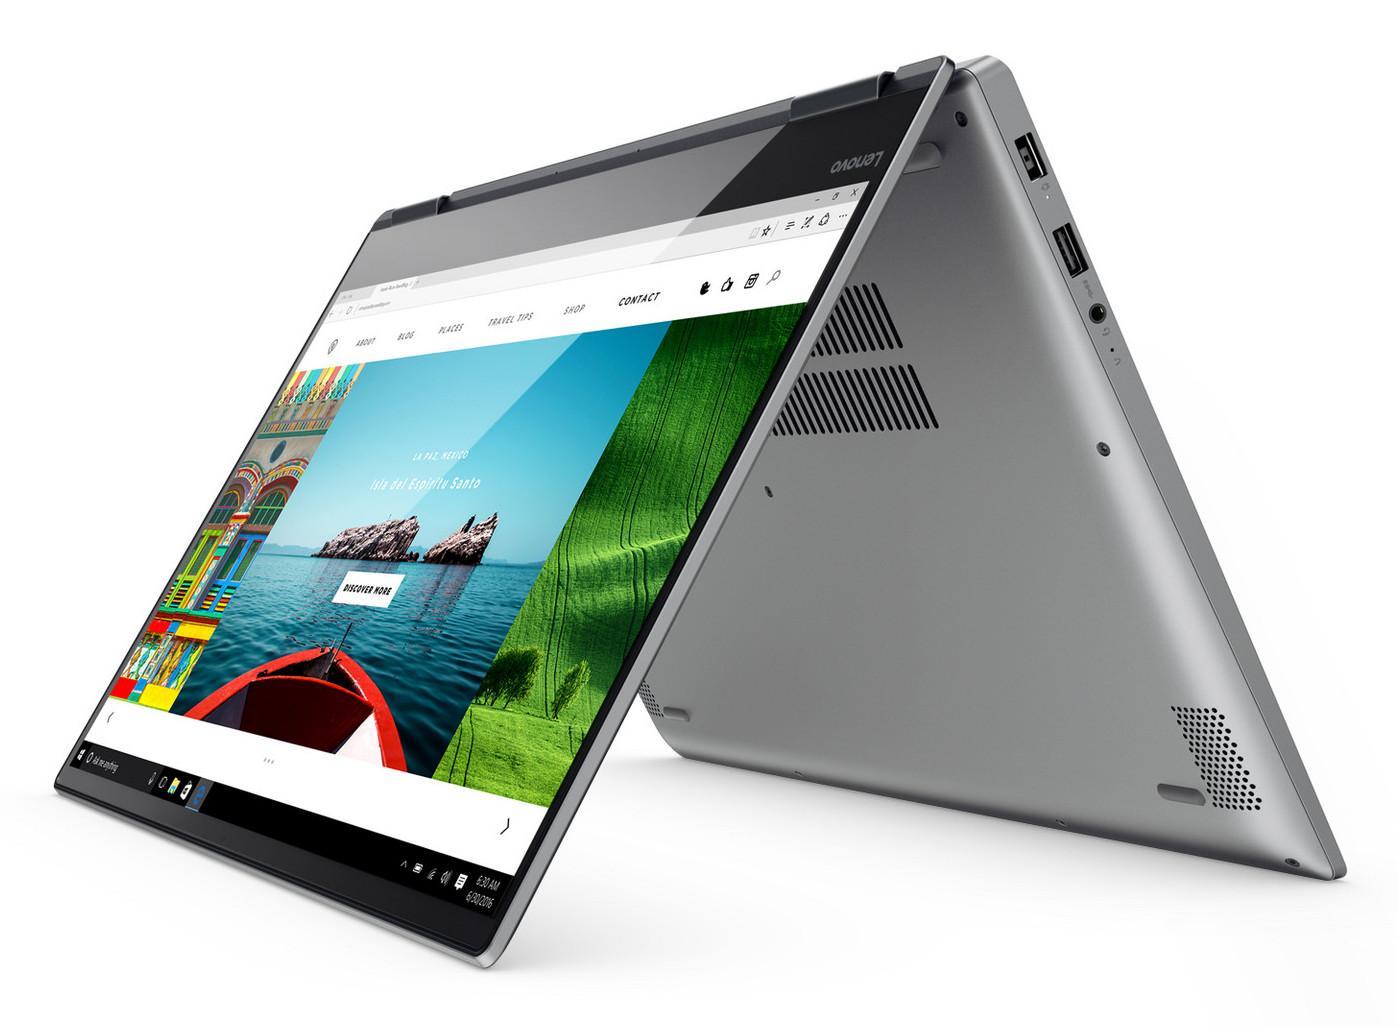 Lenovo IdeaPad Yoga [фотообзор]